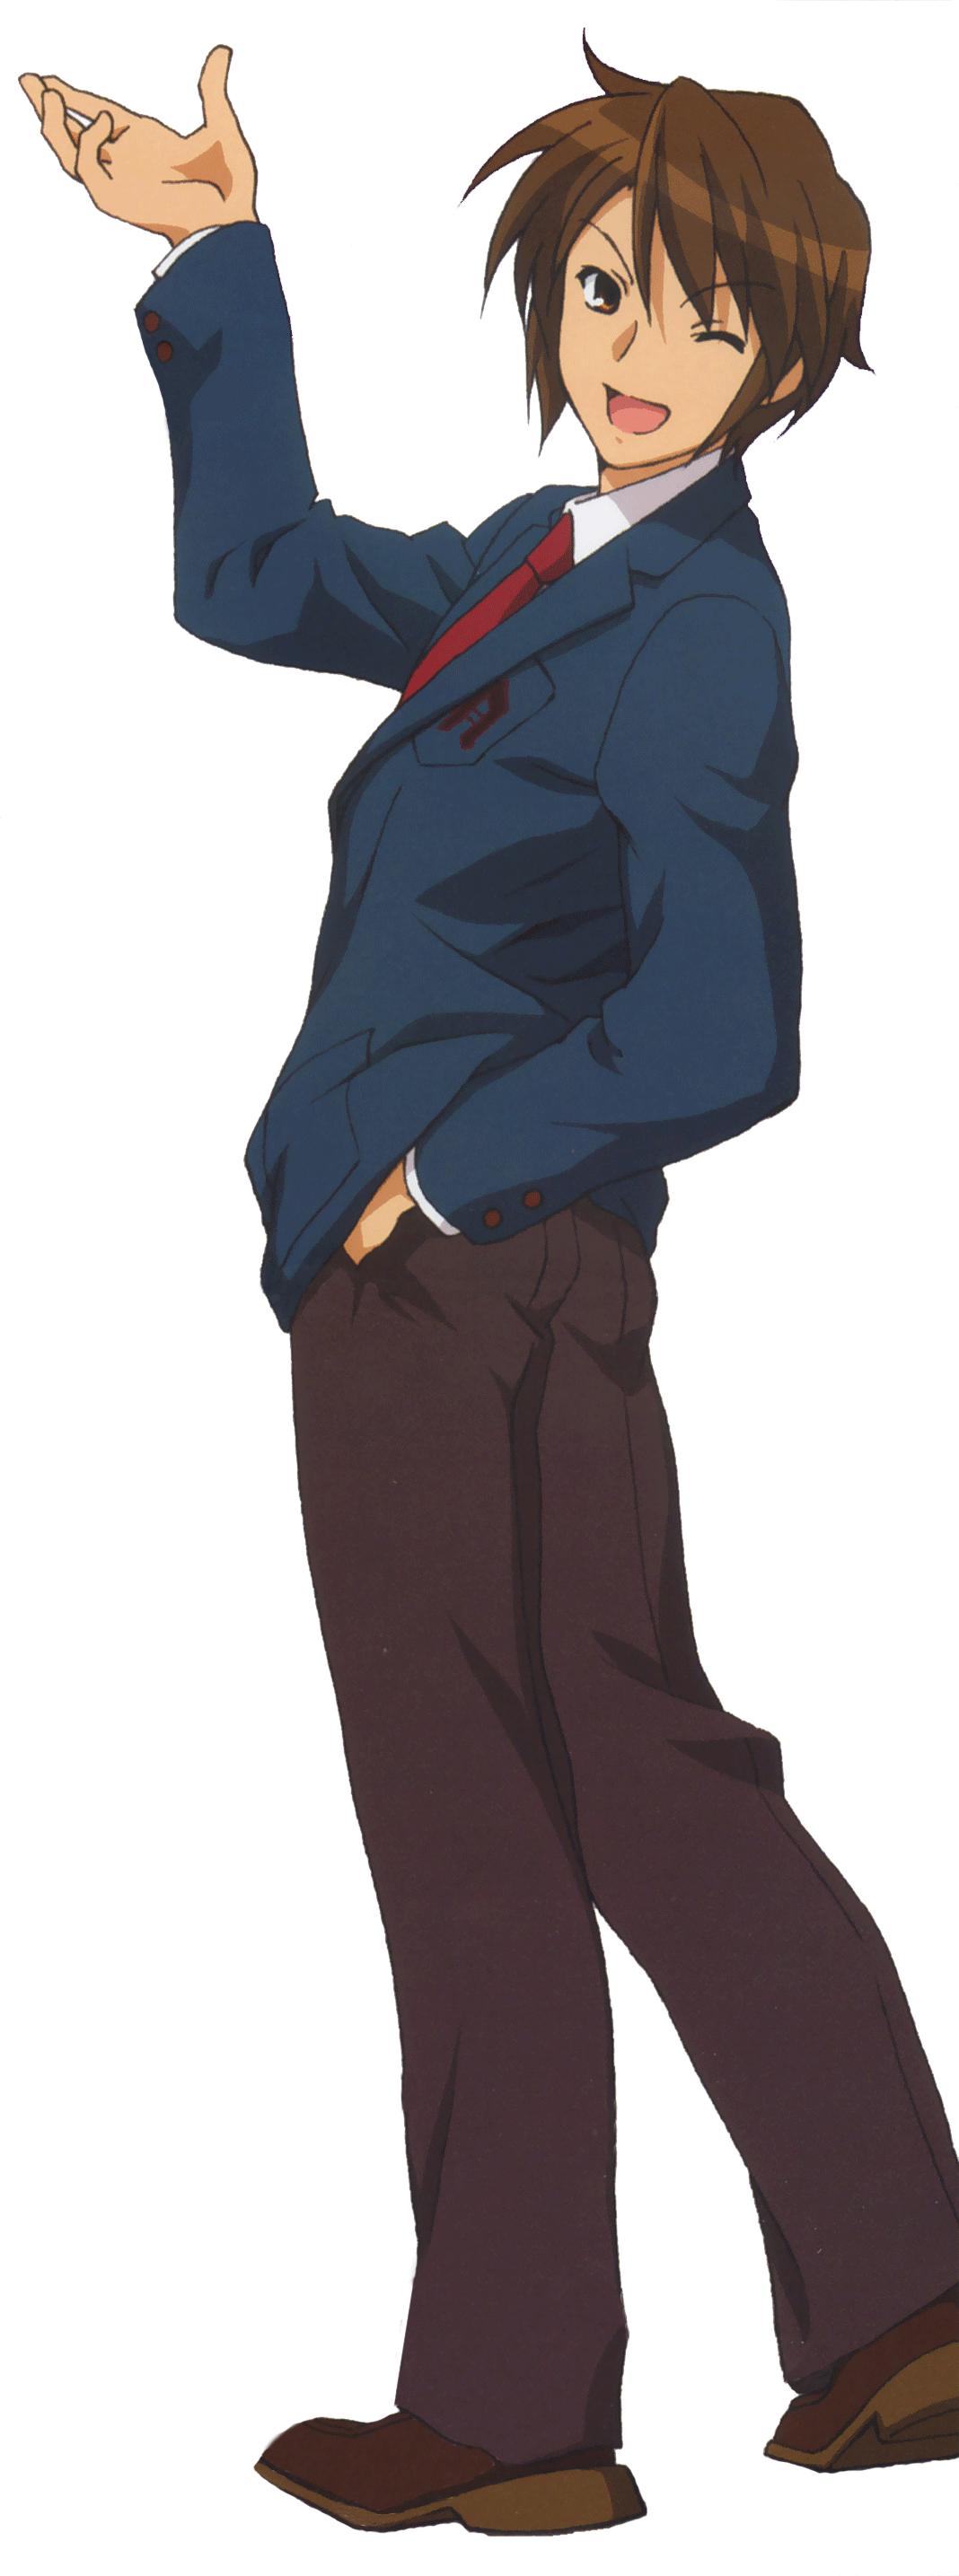 The Melancholy of Haruhi Suzumiya Koizumi Anime